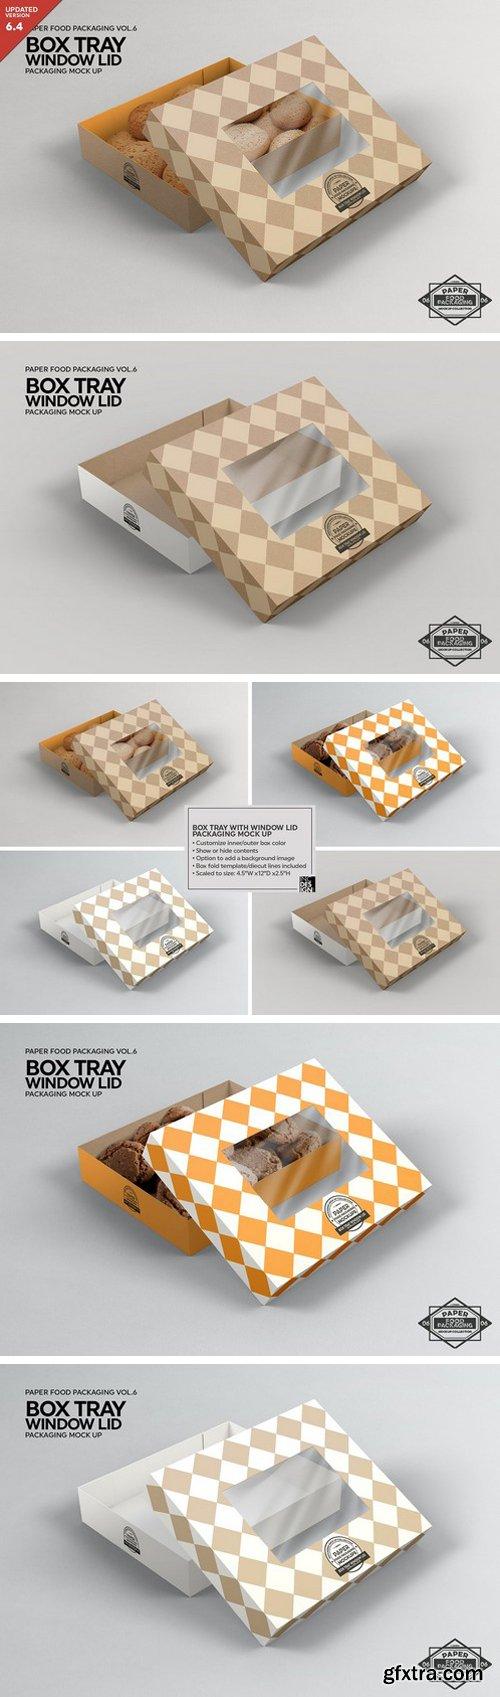 CM - Box Tray Window Lid Packaging Mockup 2306710